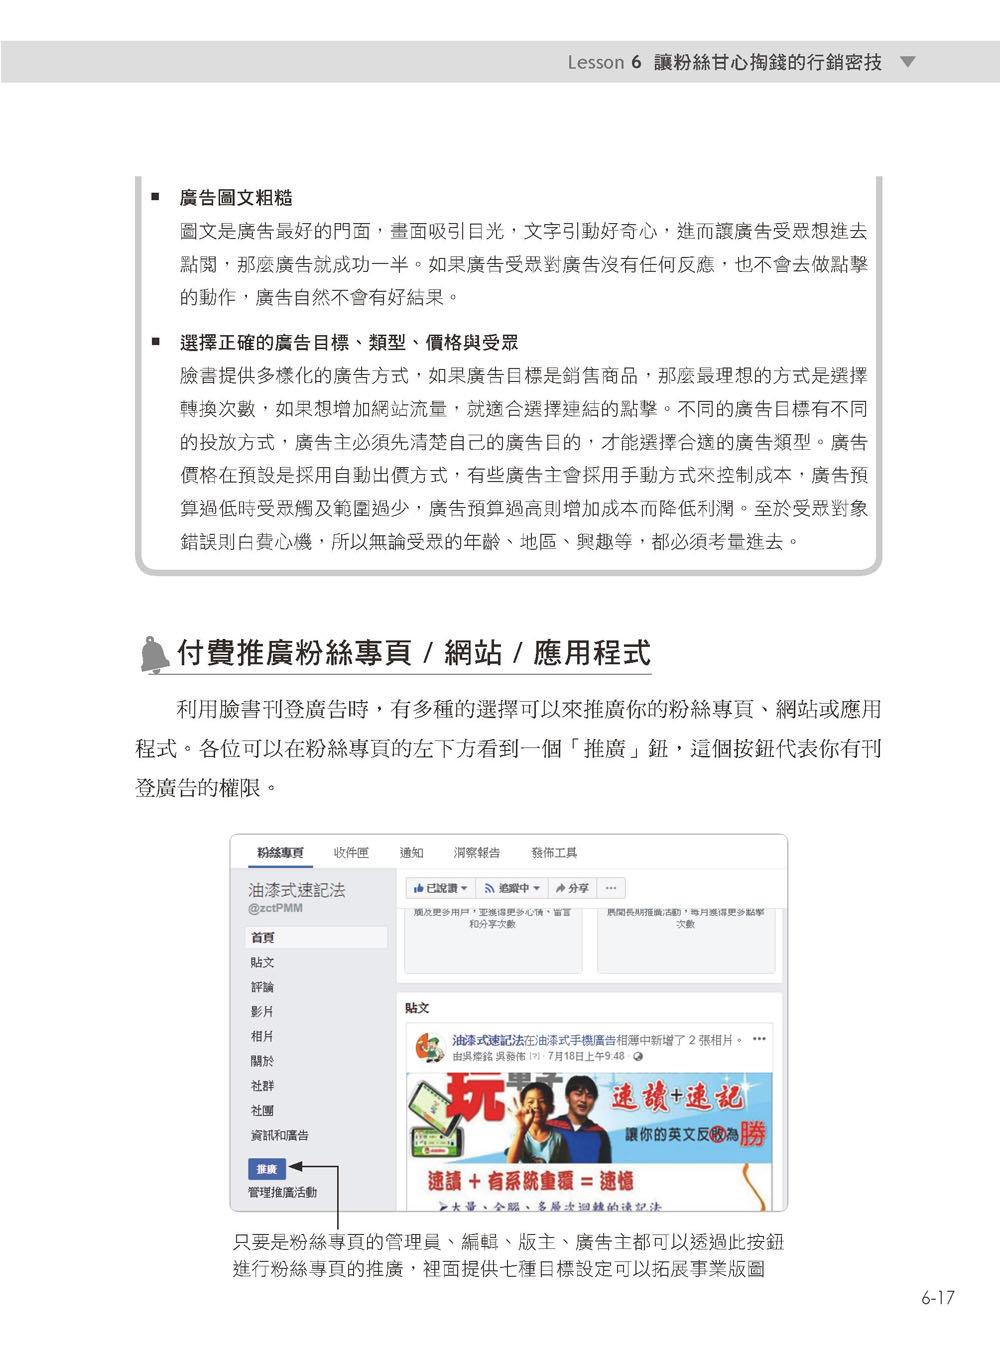 Facebook 互動行銷:社群口碑經營新思路+廣告投放如何有成效,想做好臉書行銷,操作心法就在這!-preview-16